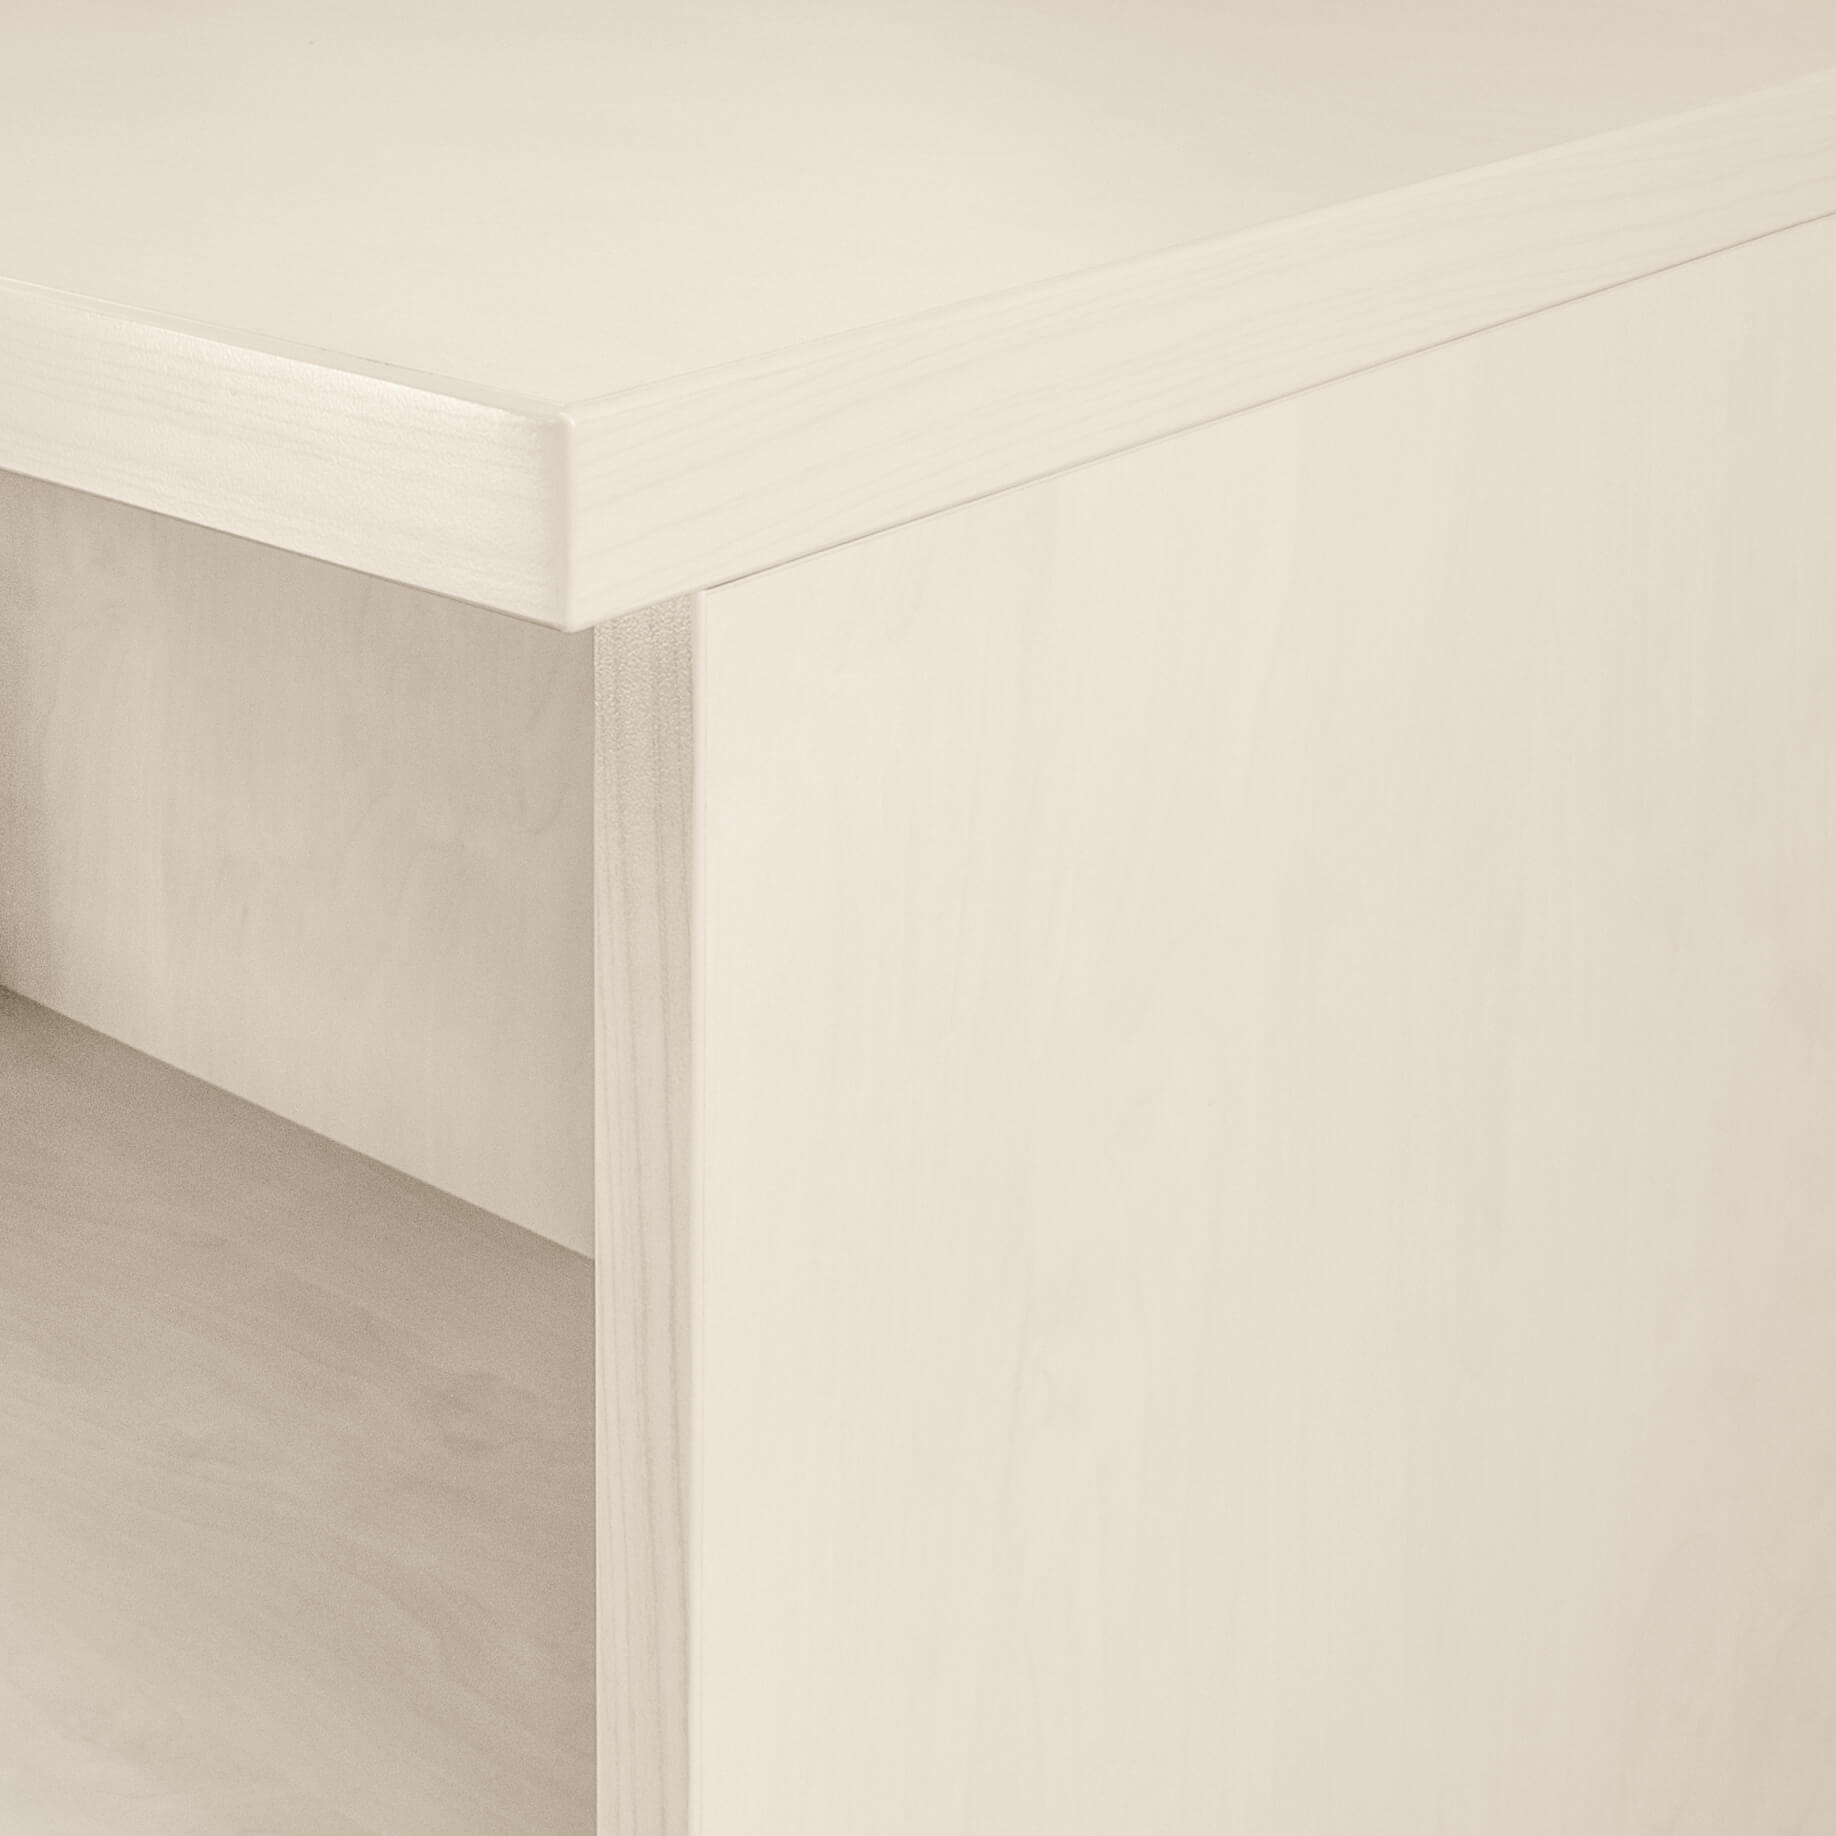 UNI Schiebetürenschrank 1 Meter breit abschließbar 2OH AhornSchrank Büroschrank